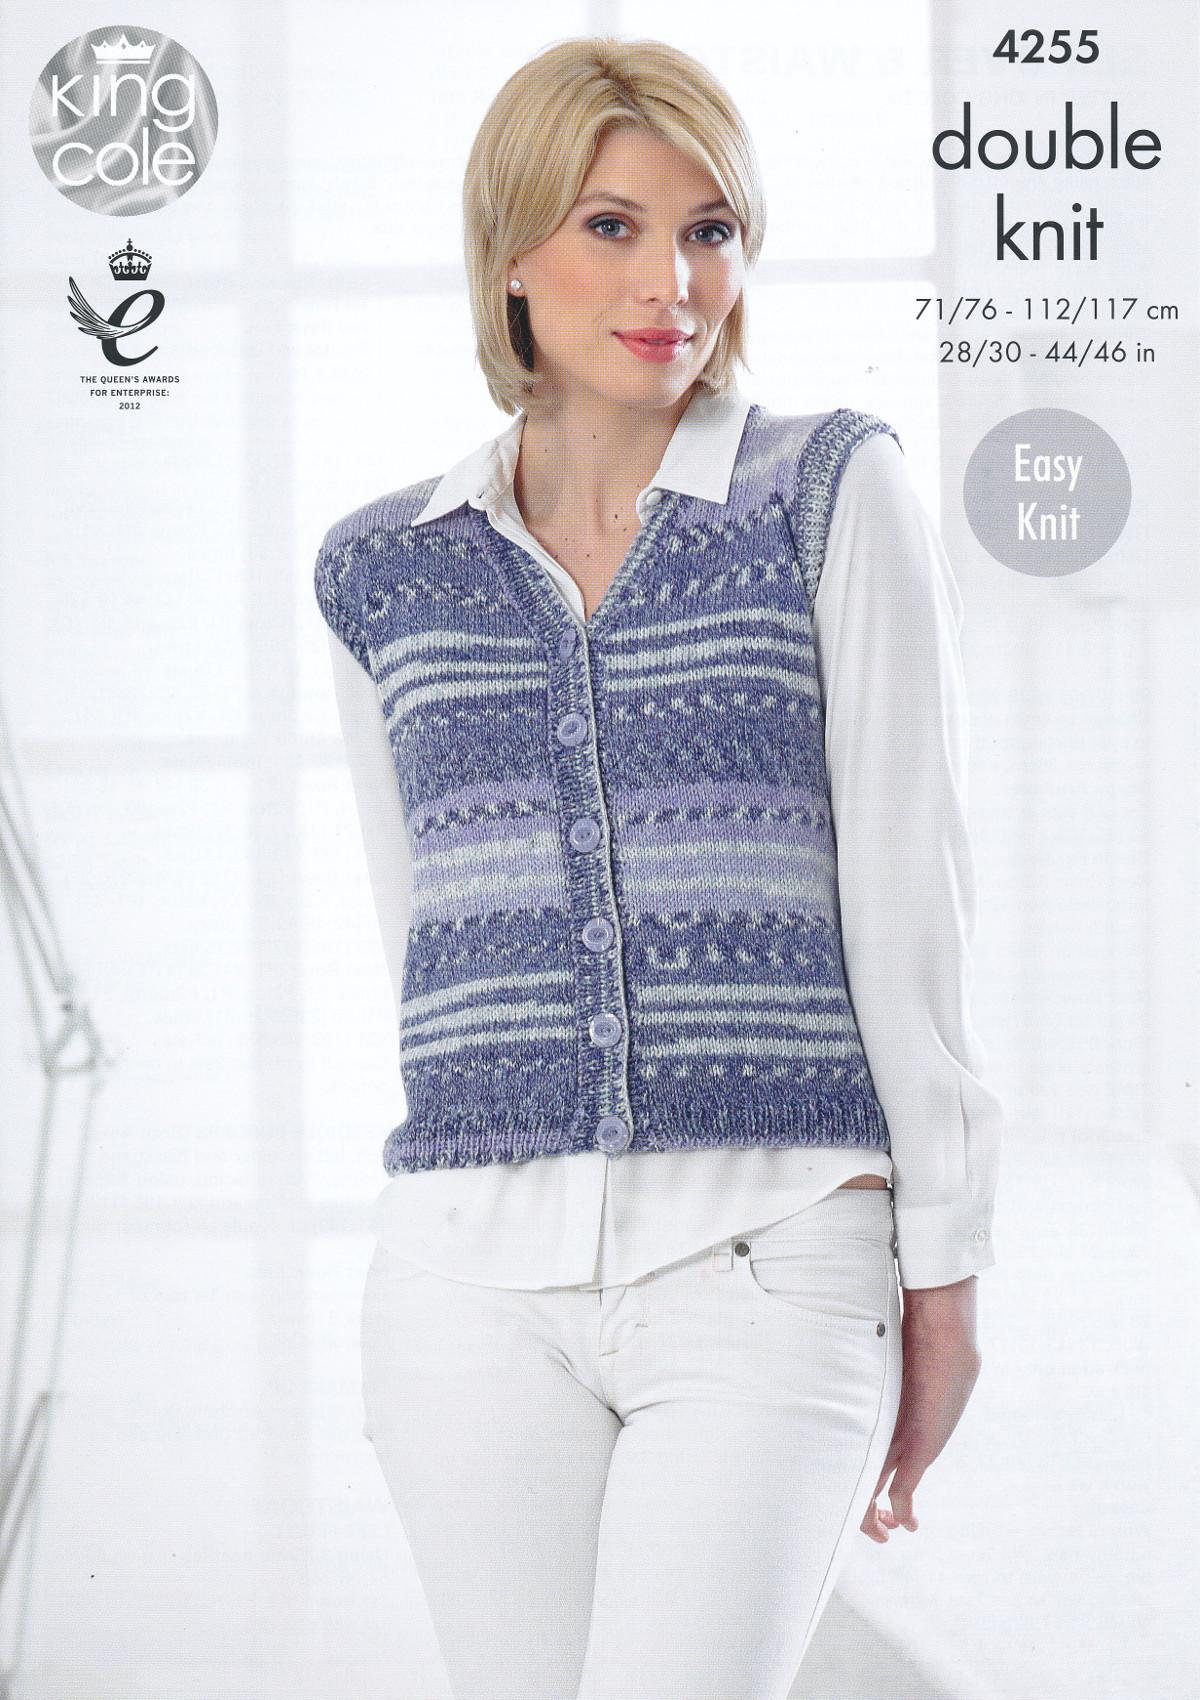 Womens Waistcoat Sleeveless Slipover Knitting Pattern ...